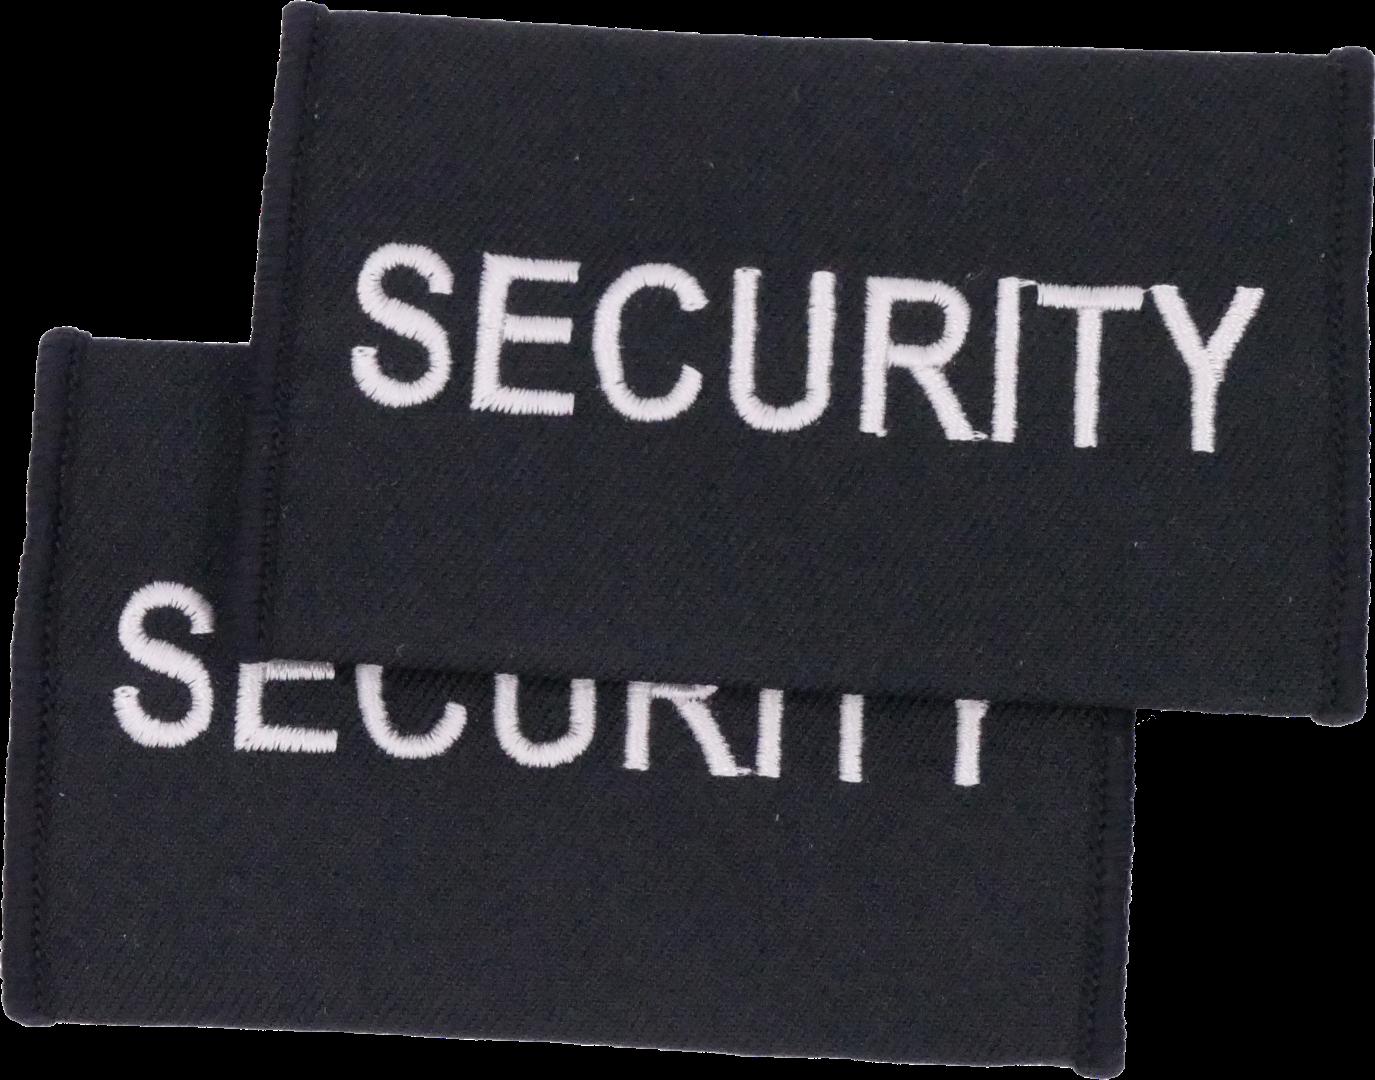 SECURITY grau auf black